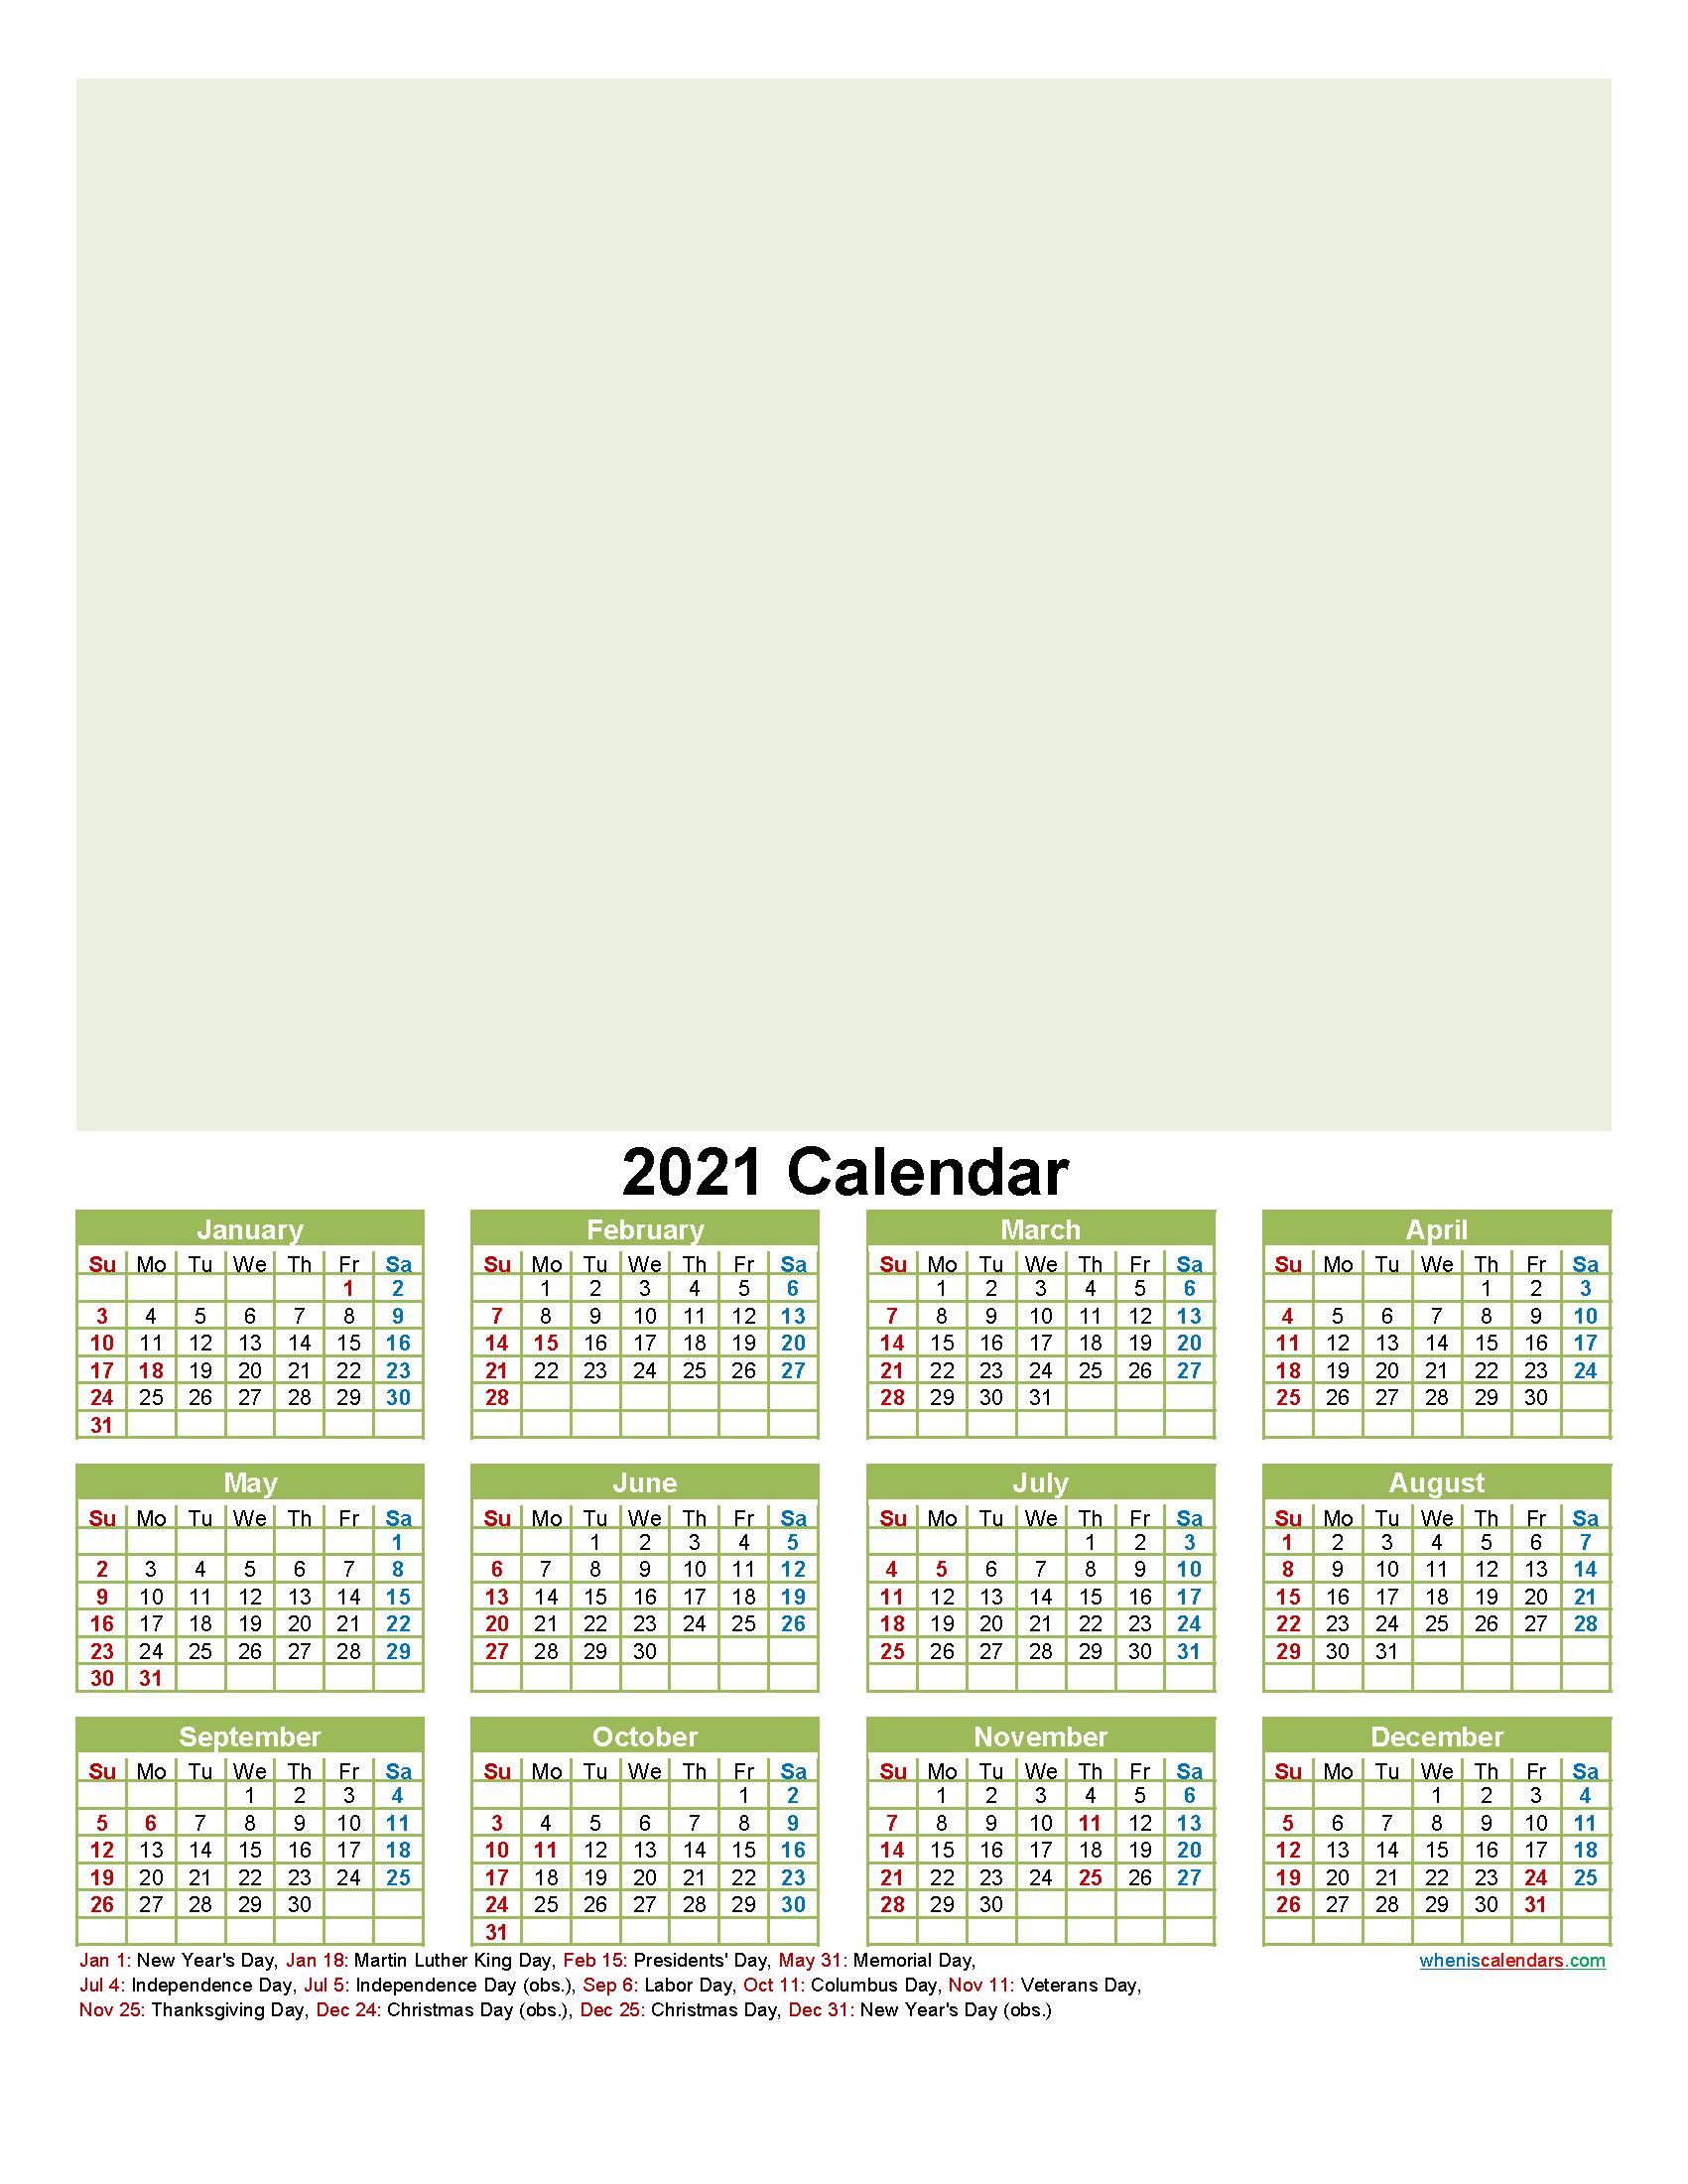 Personalised Photo Calendar 2021